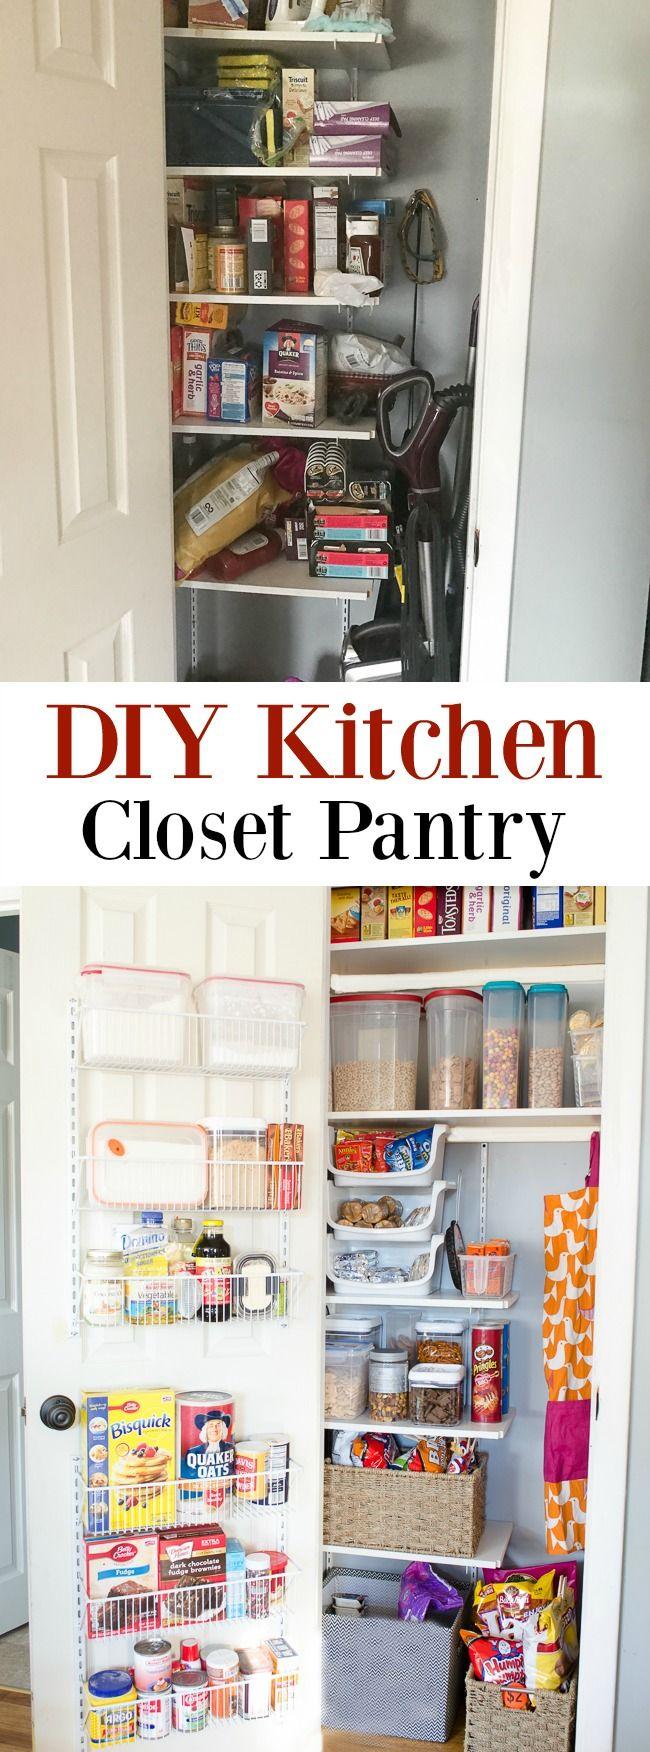 Diy kitchen closet pantry under armadio stoccaggio e